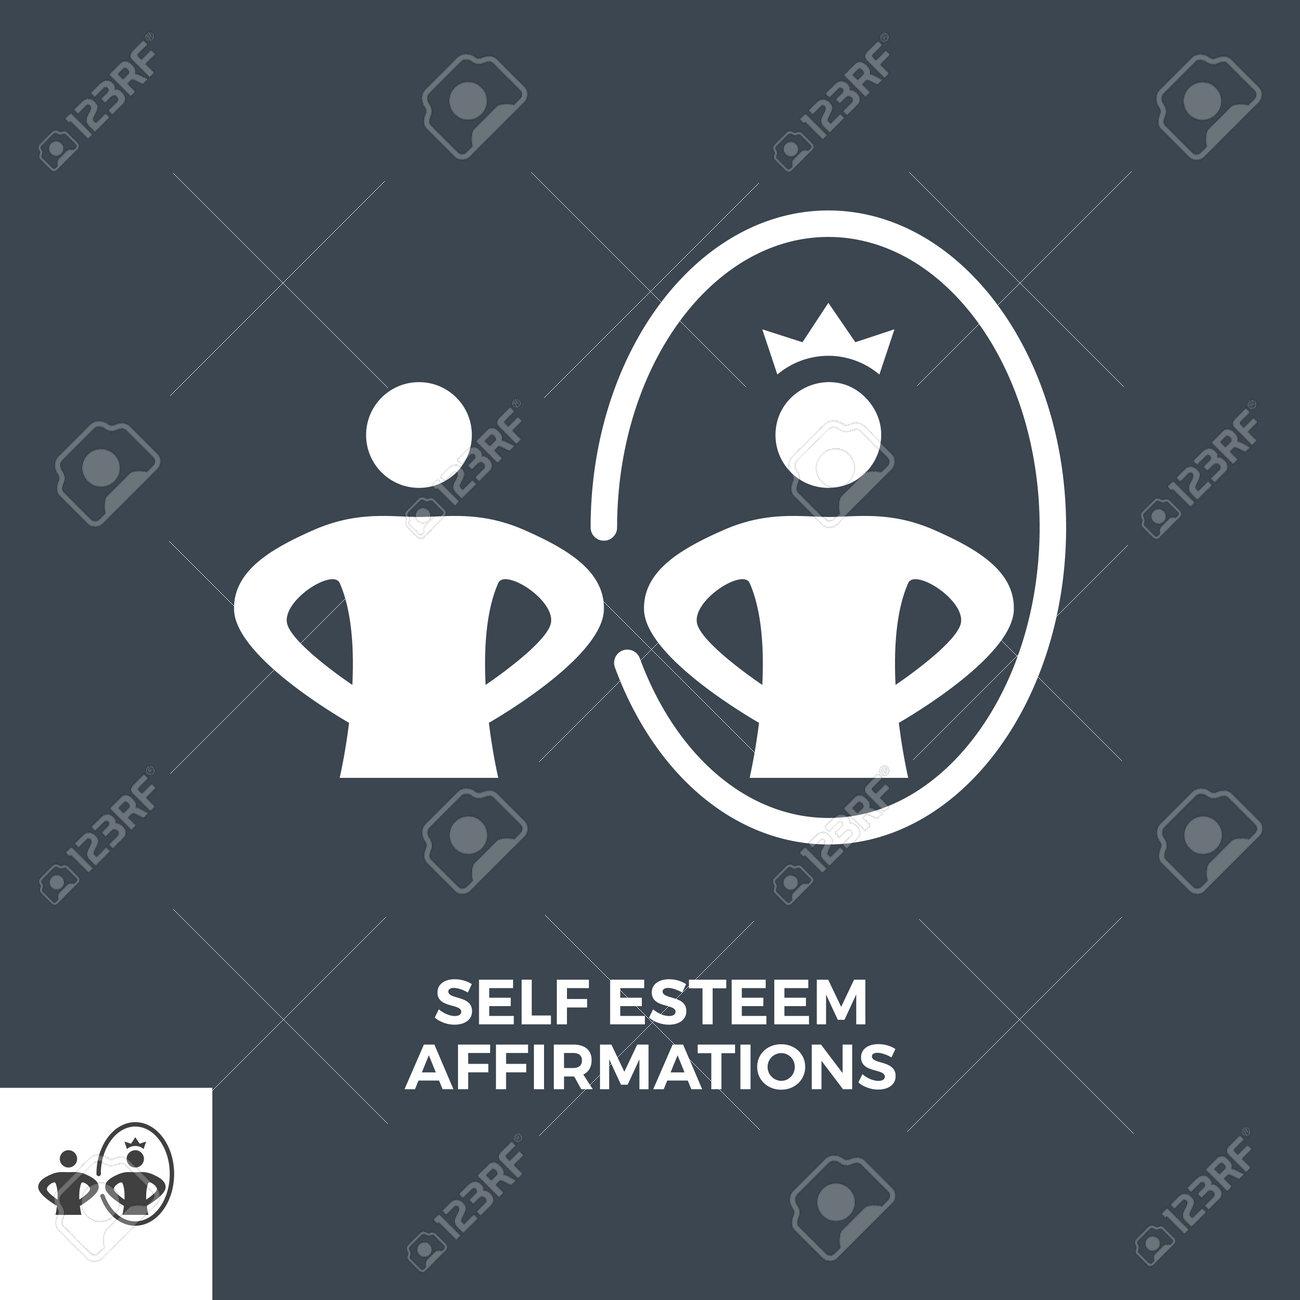 Self Esteem Affirmations Glyph Vector Icon. - 160579743